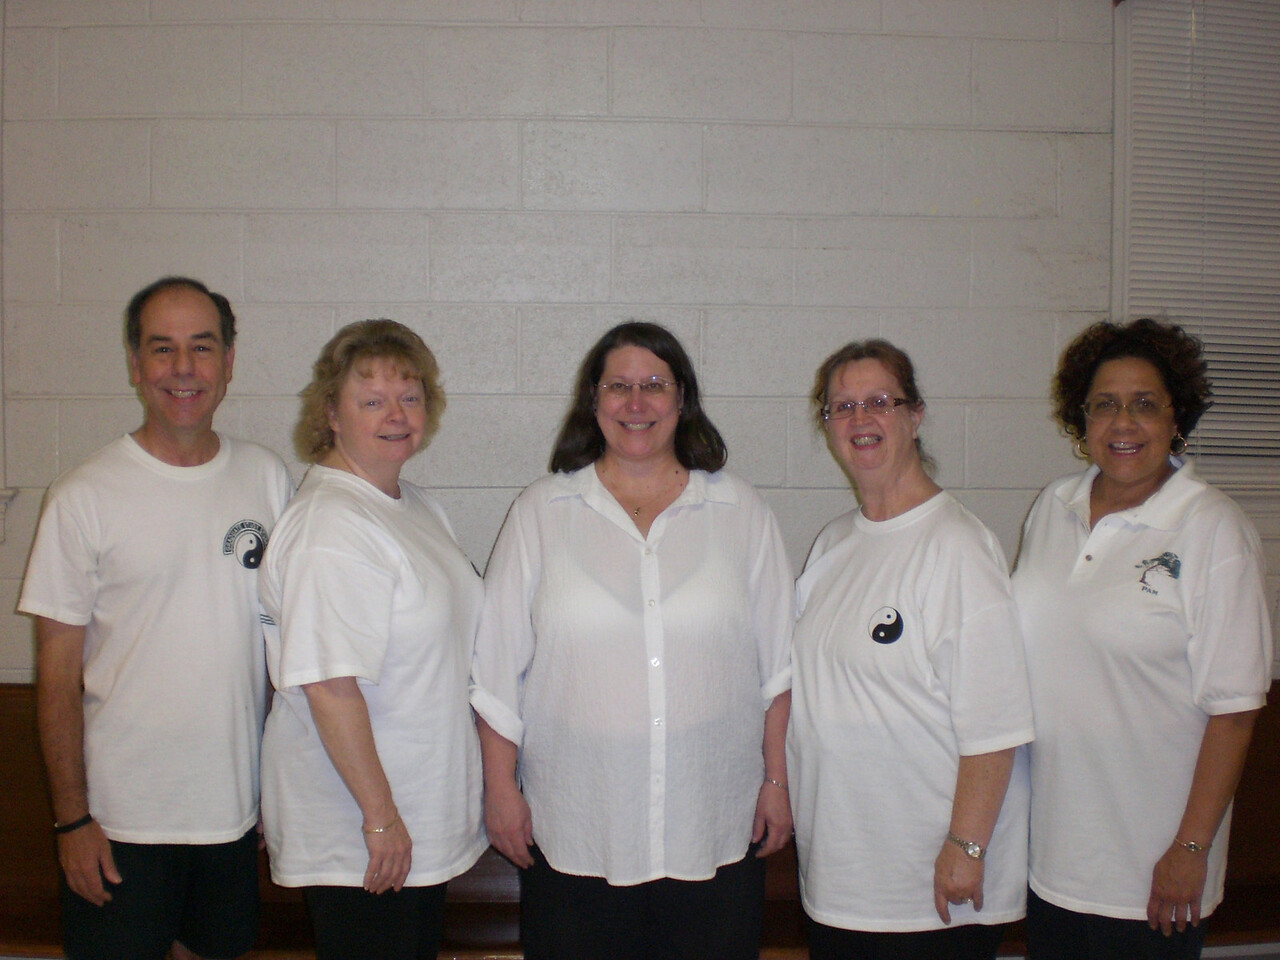 Tuesday July 2007 Hampton Class: Dave Watts - Class Coordinator, Barbara Fagley, Ann Higgenbothem, Pat Walls, Pam Paster - Instructor.